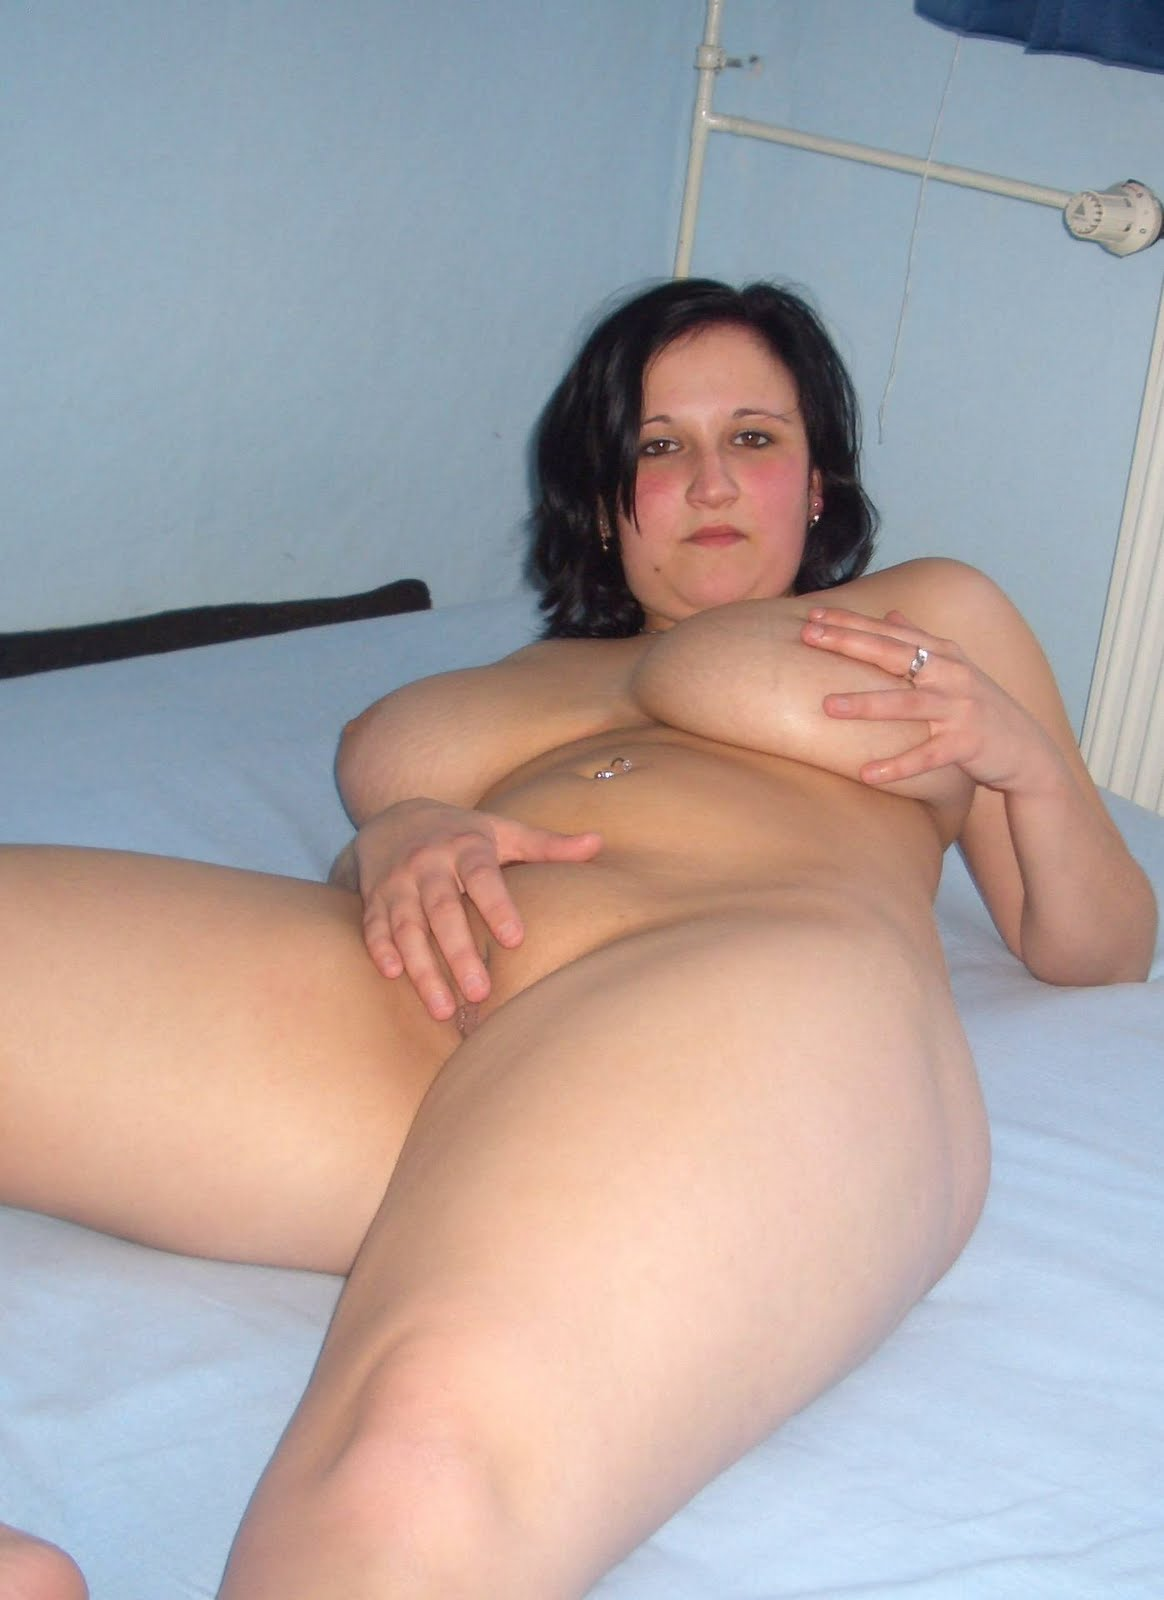 Chubby nude next door hot naked pics